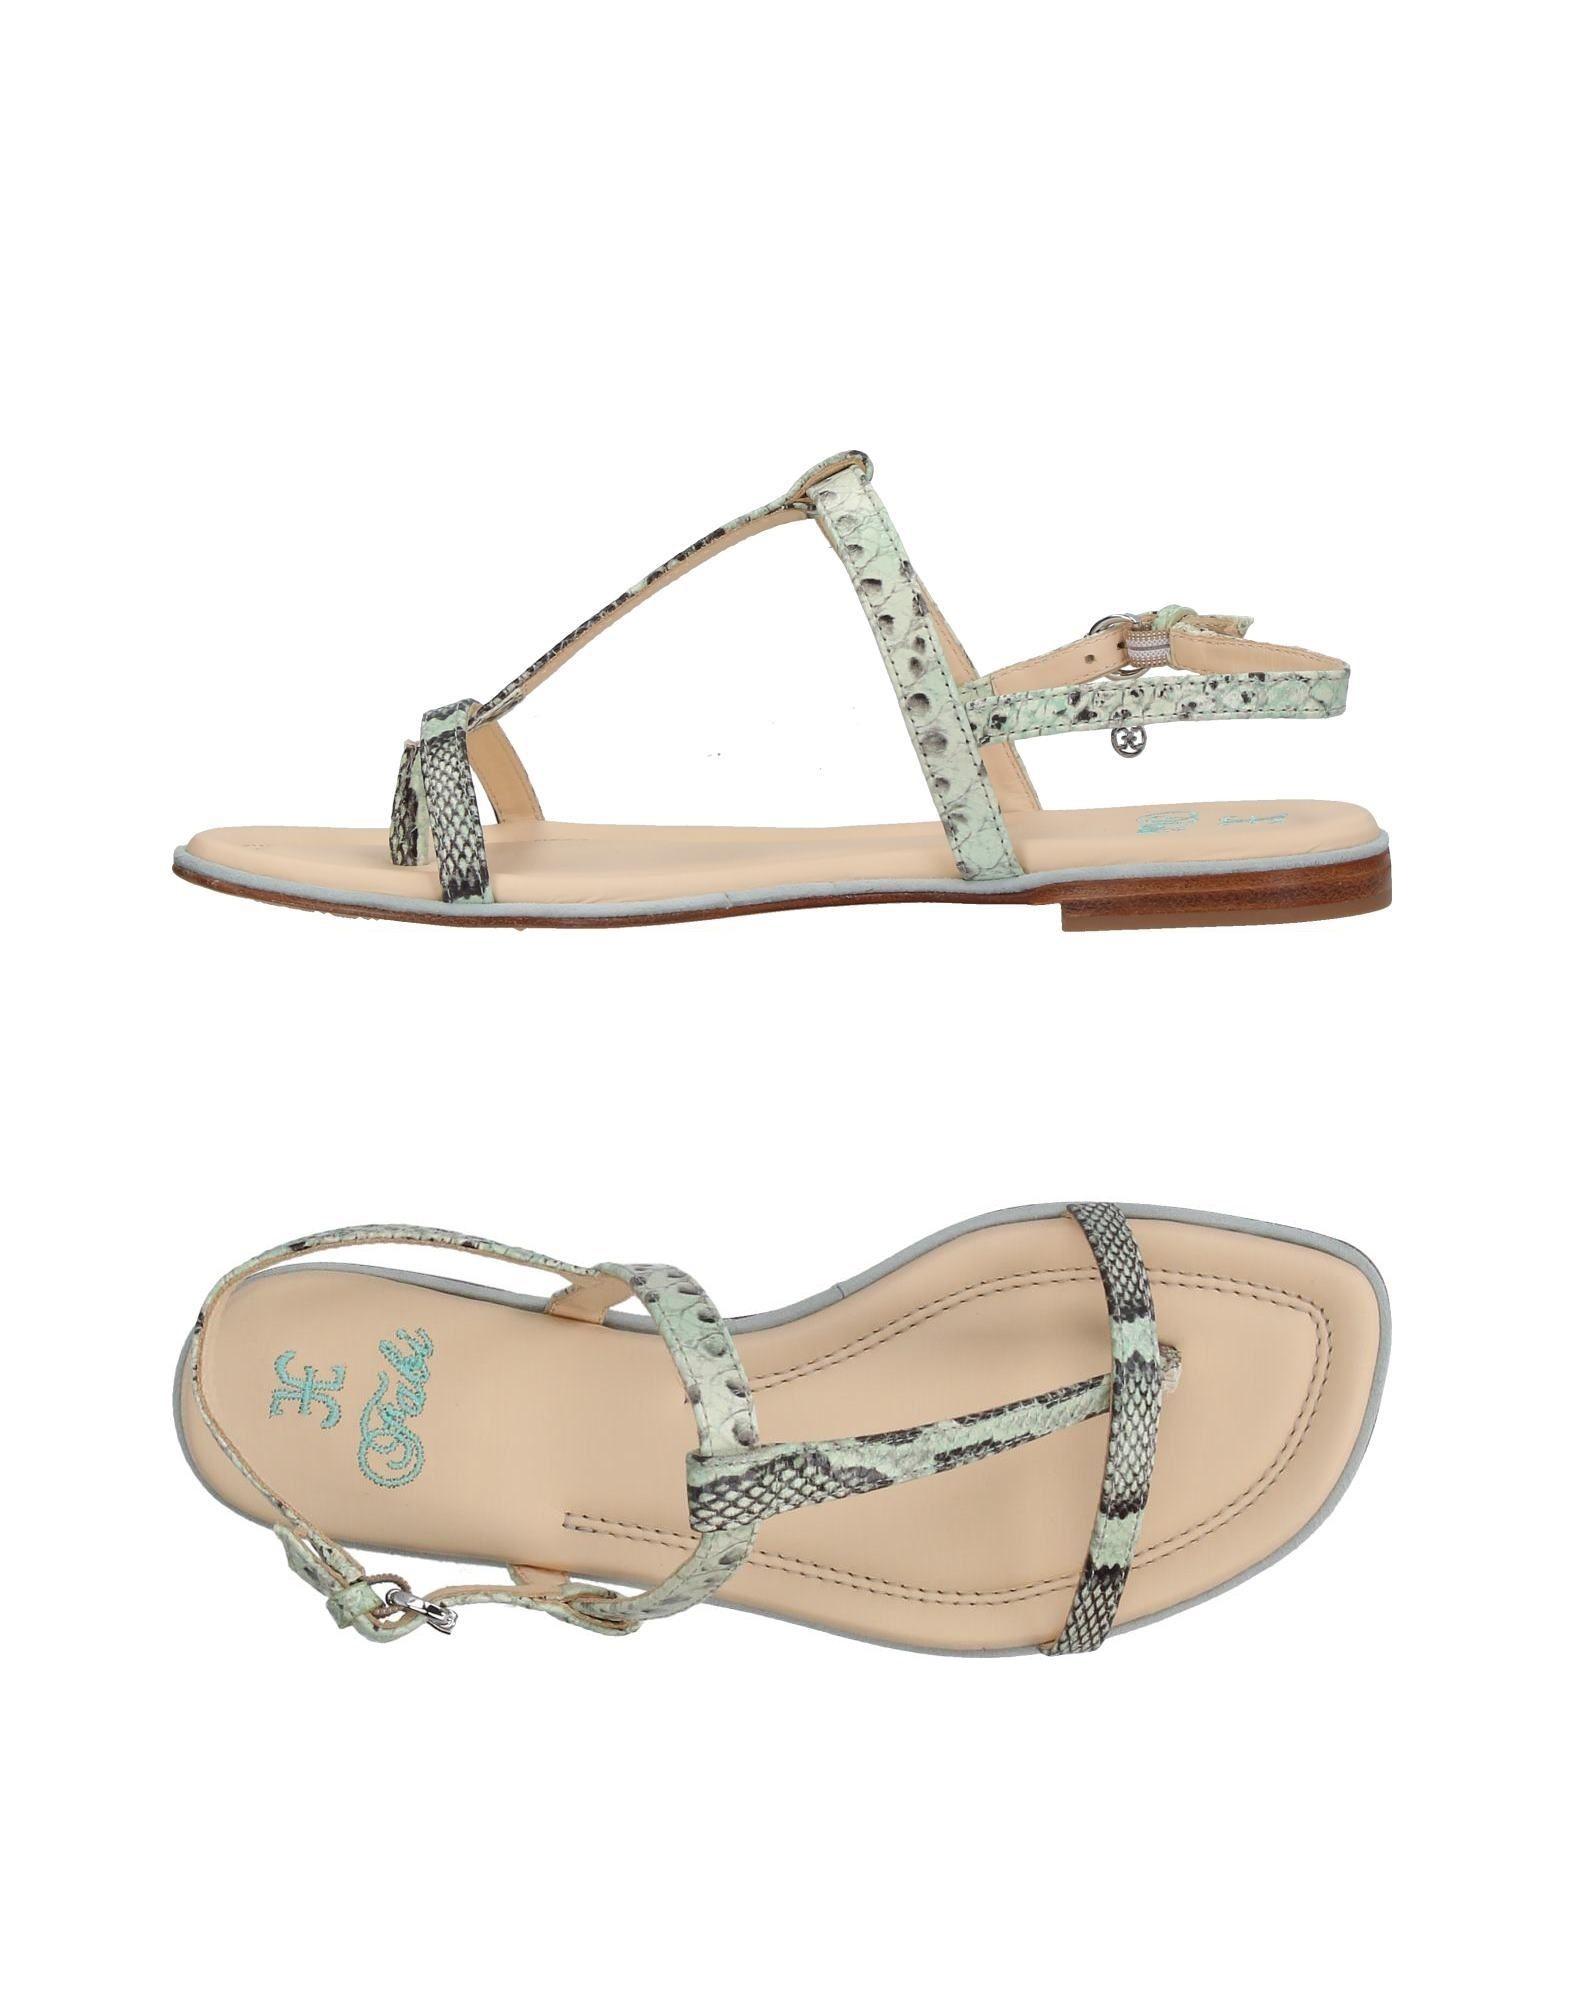 Fabi Fabi Fabi Dianetten Damen  11415780CE Gute Qualität beliebte Schuhe bb4858